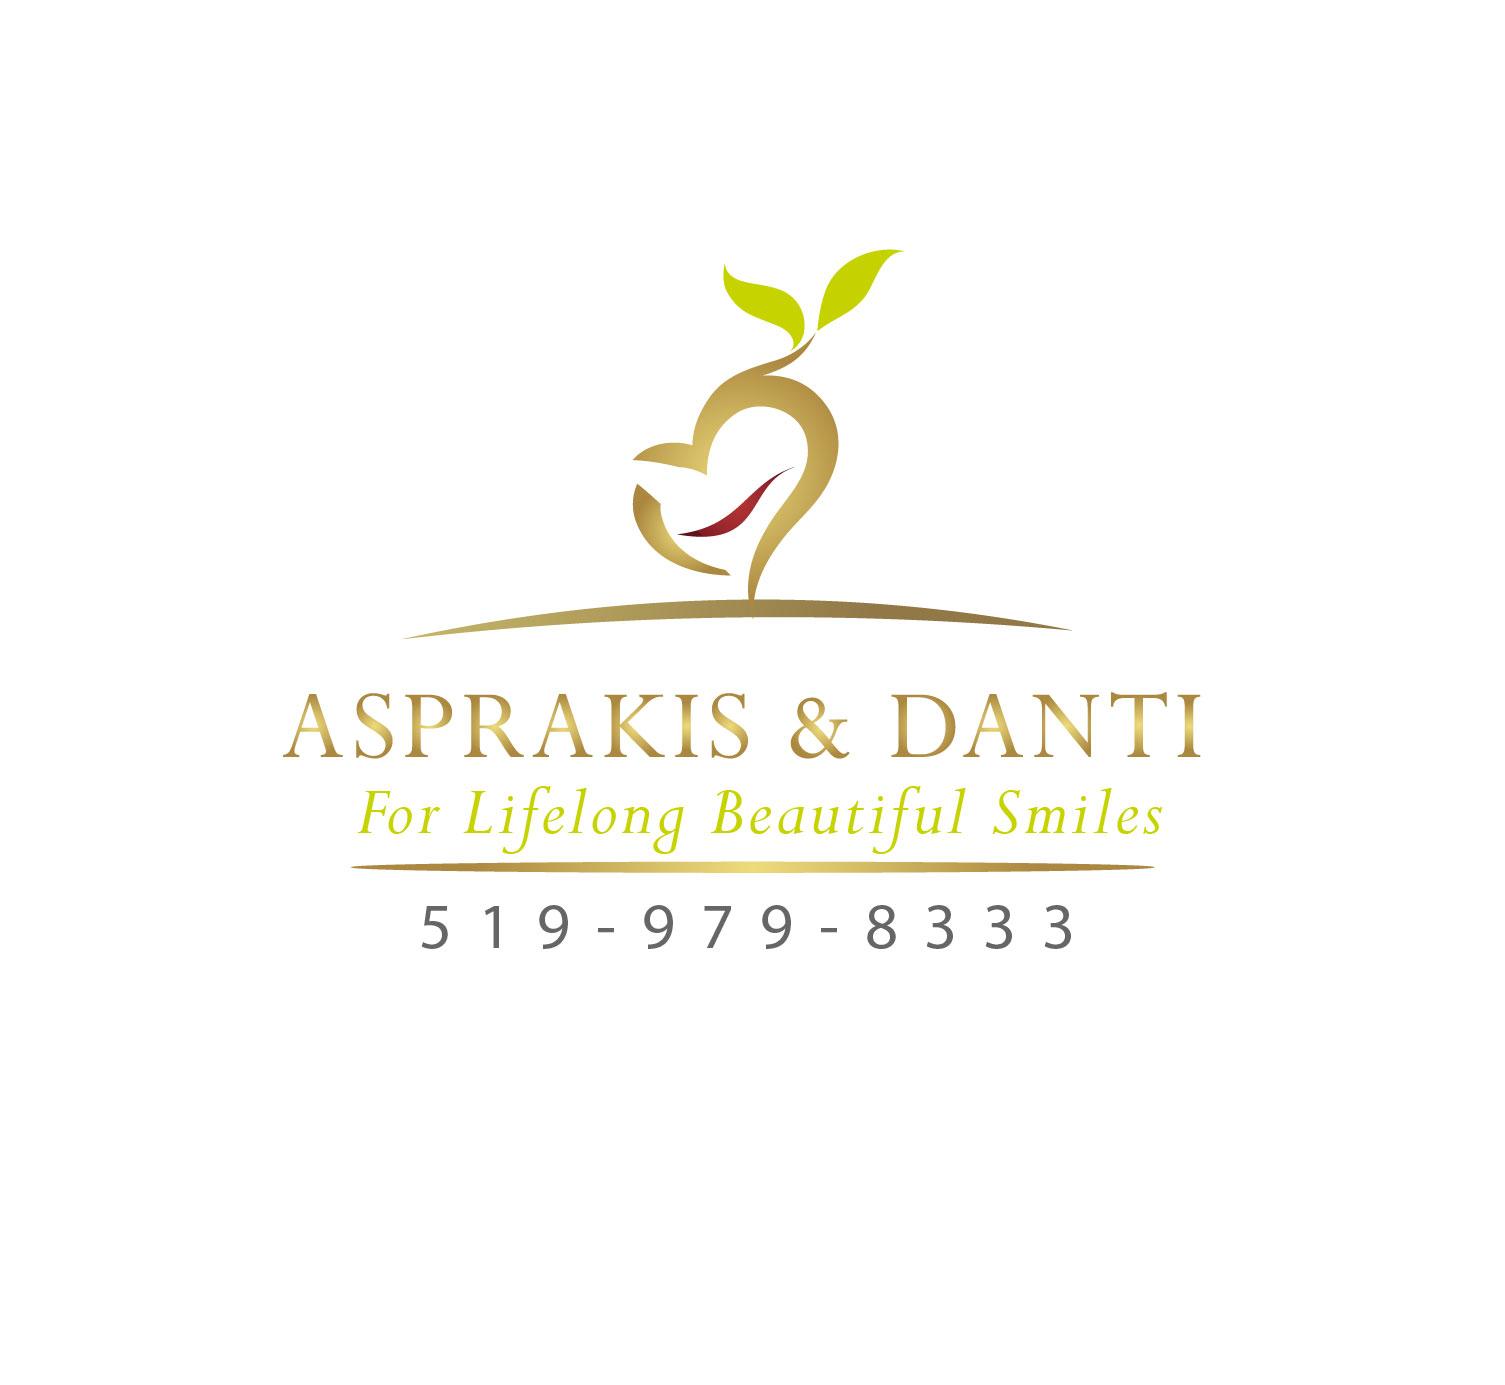 Logo Design by Darina Dimitrova - Entry No. 51 in the Logo Design Contest Unique Logo Design Wanted for Asprakis and Danti.